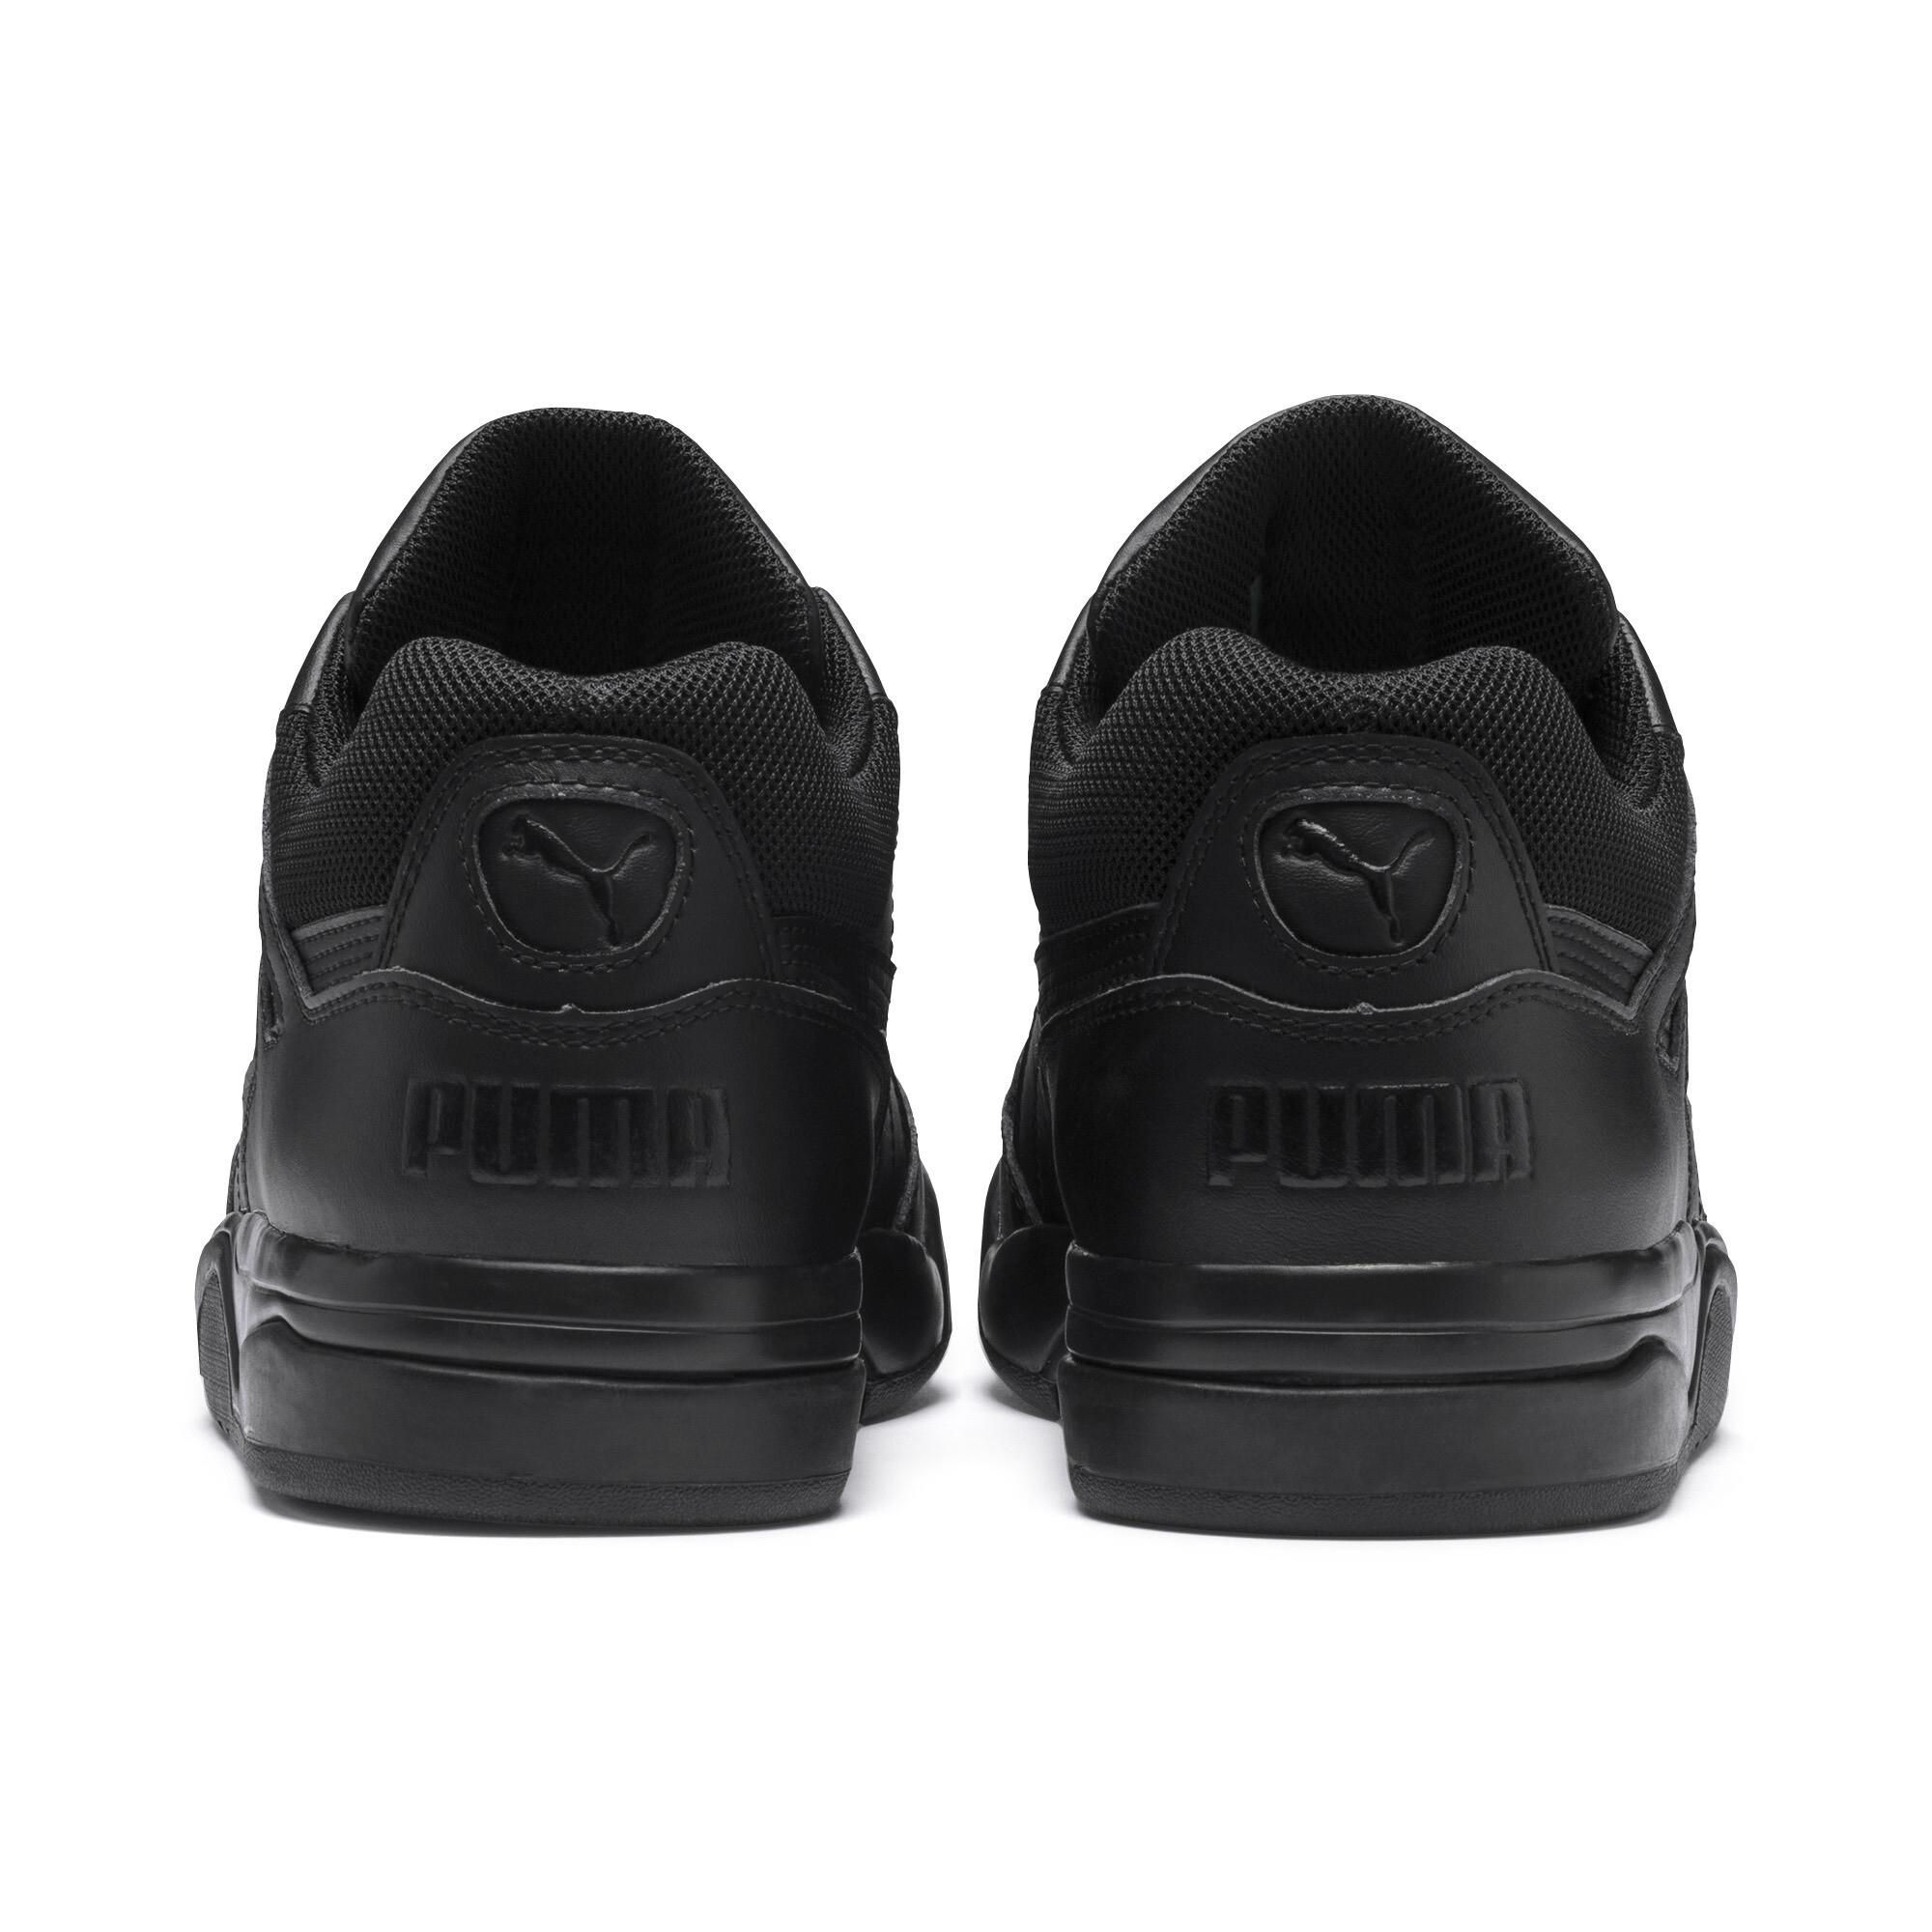 Indexbild 21 - PUMA Palace Guard Sneaker Unisex Schuhe Sport Classics Neu